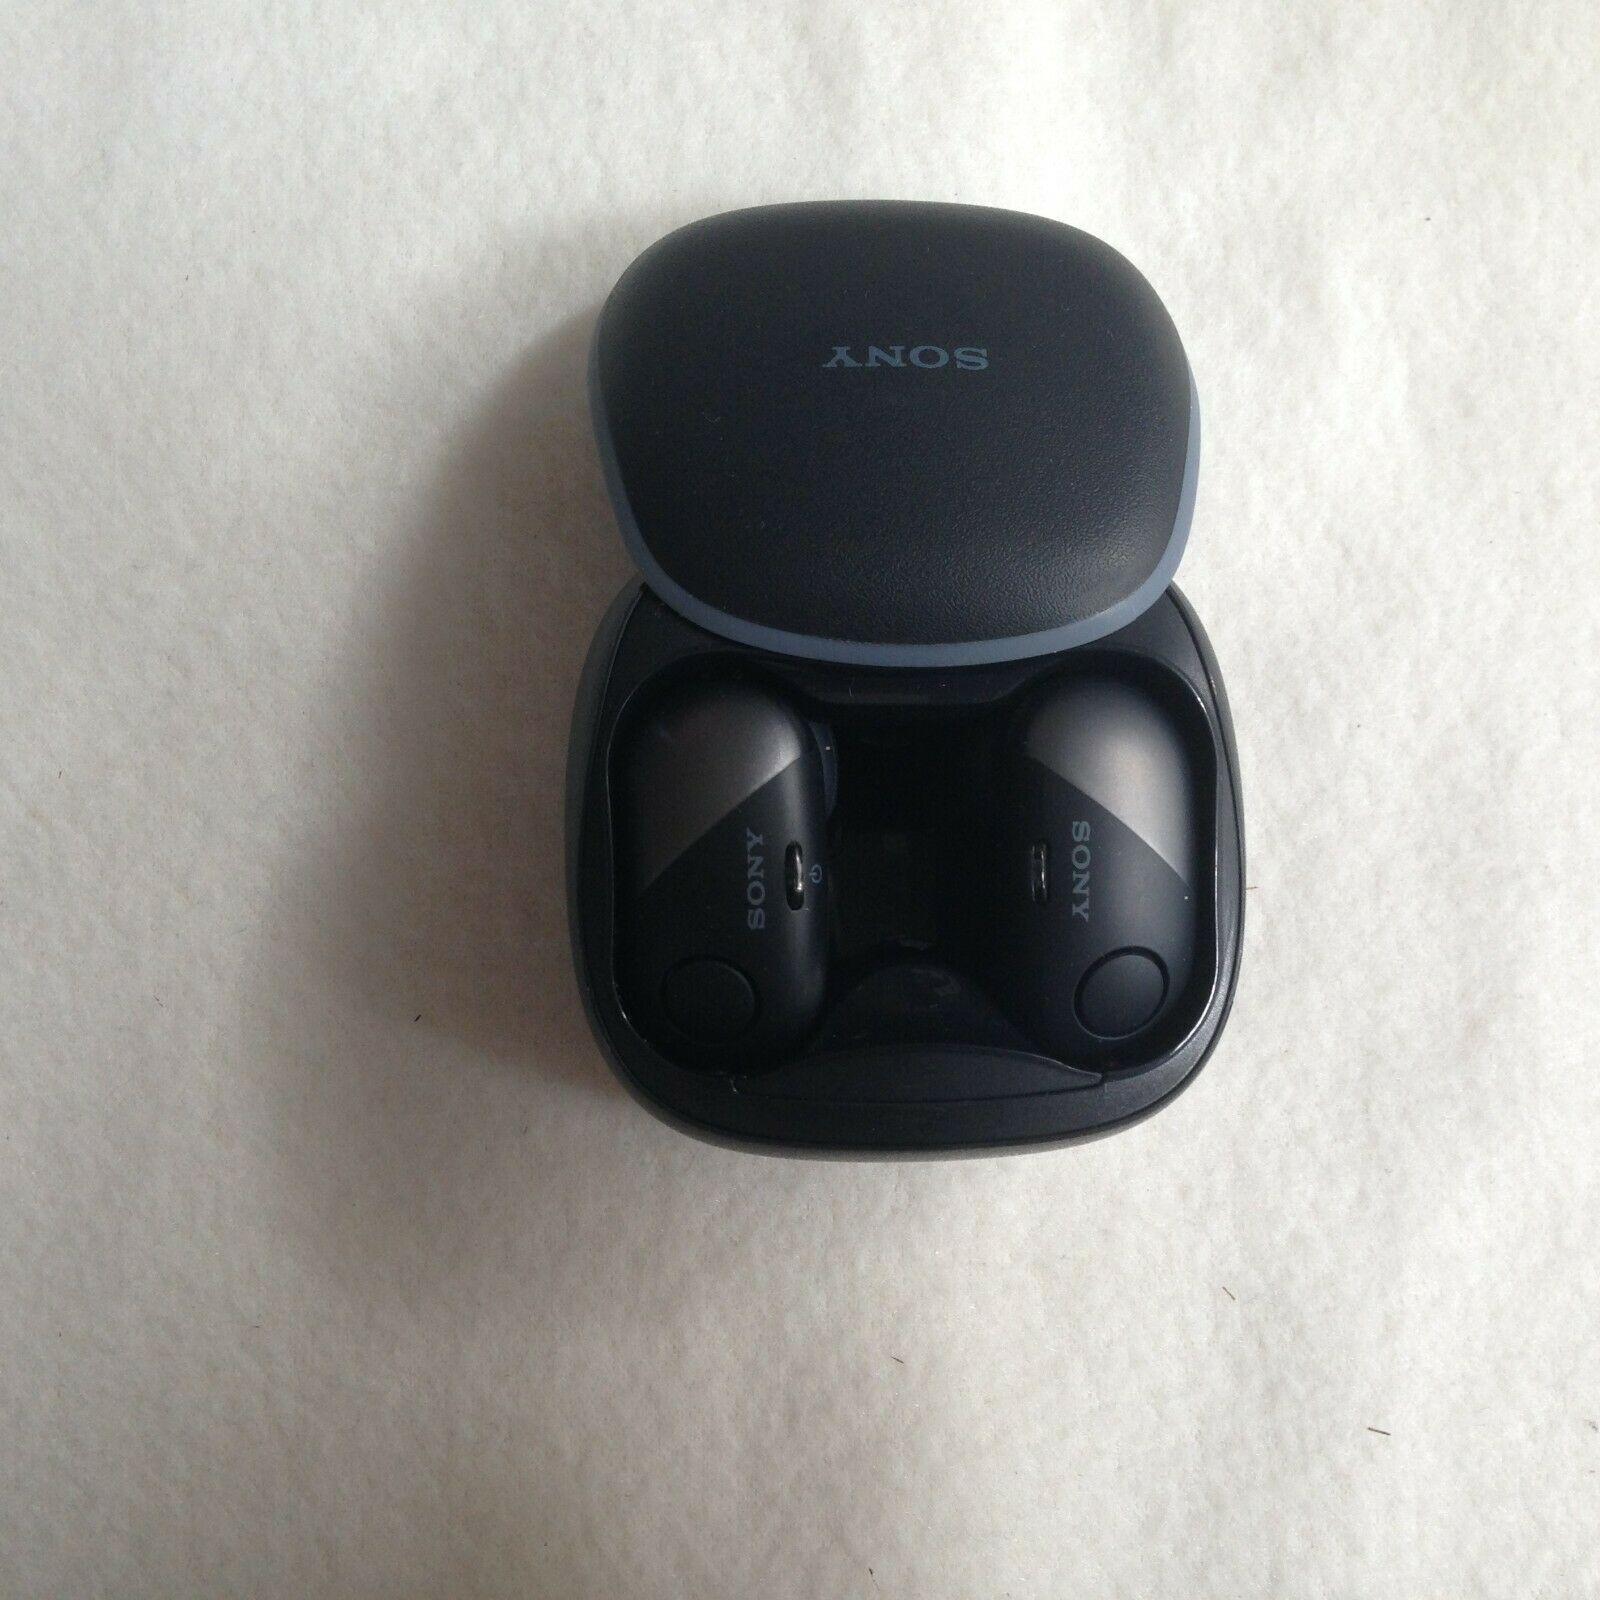 картинка Sony WF-SP700N bluetooth ausinės от магазина Одежда+